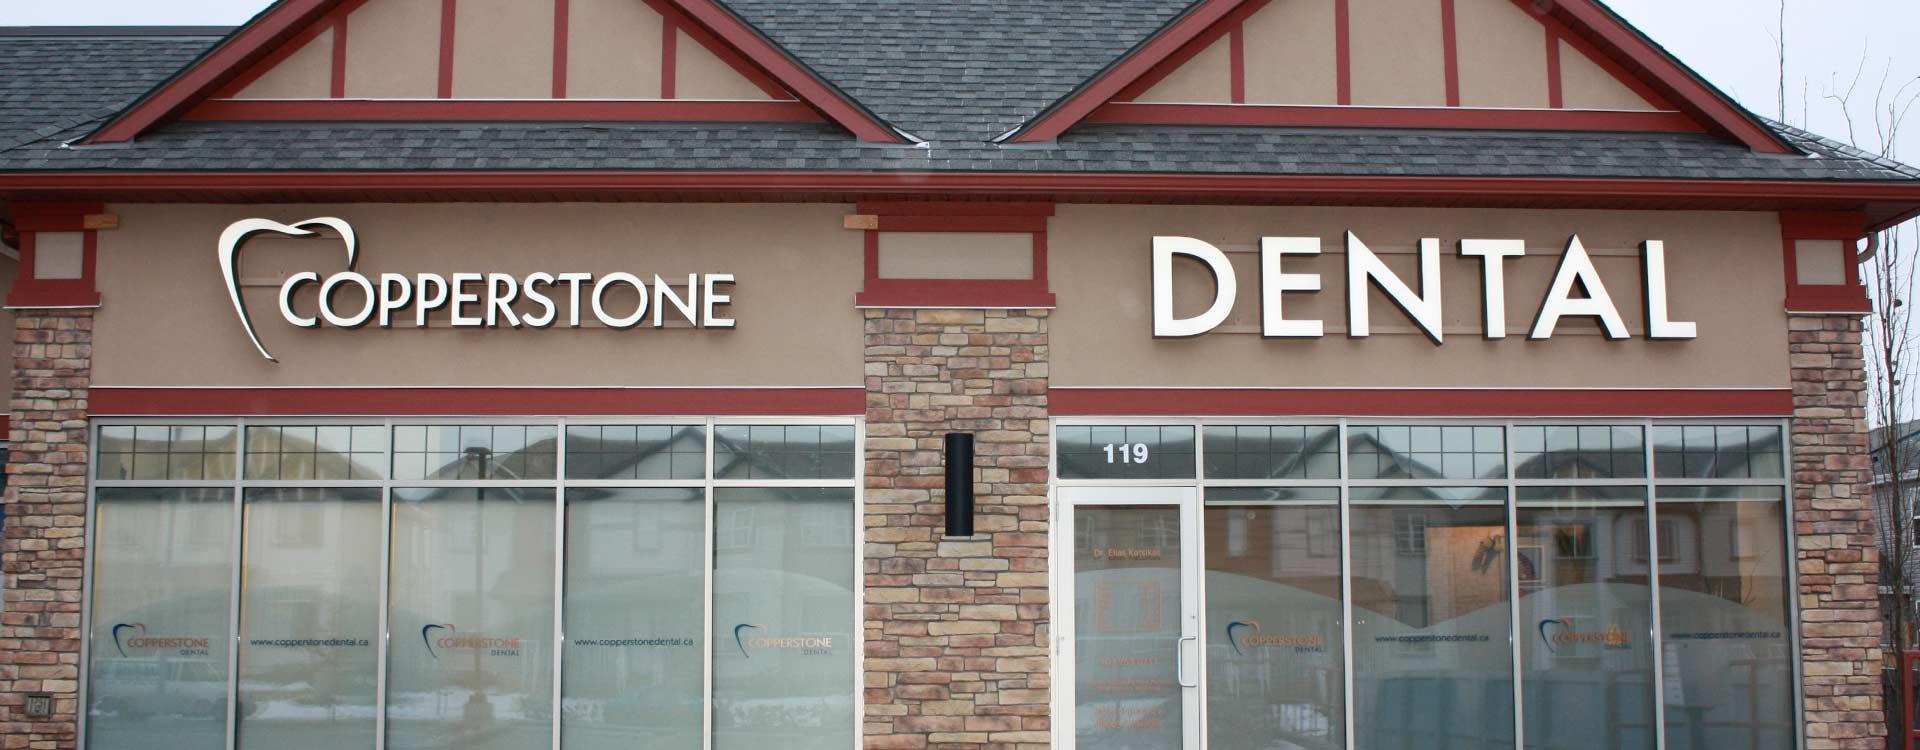 copperstone-dental-exterior-banner